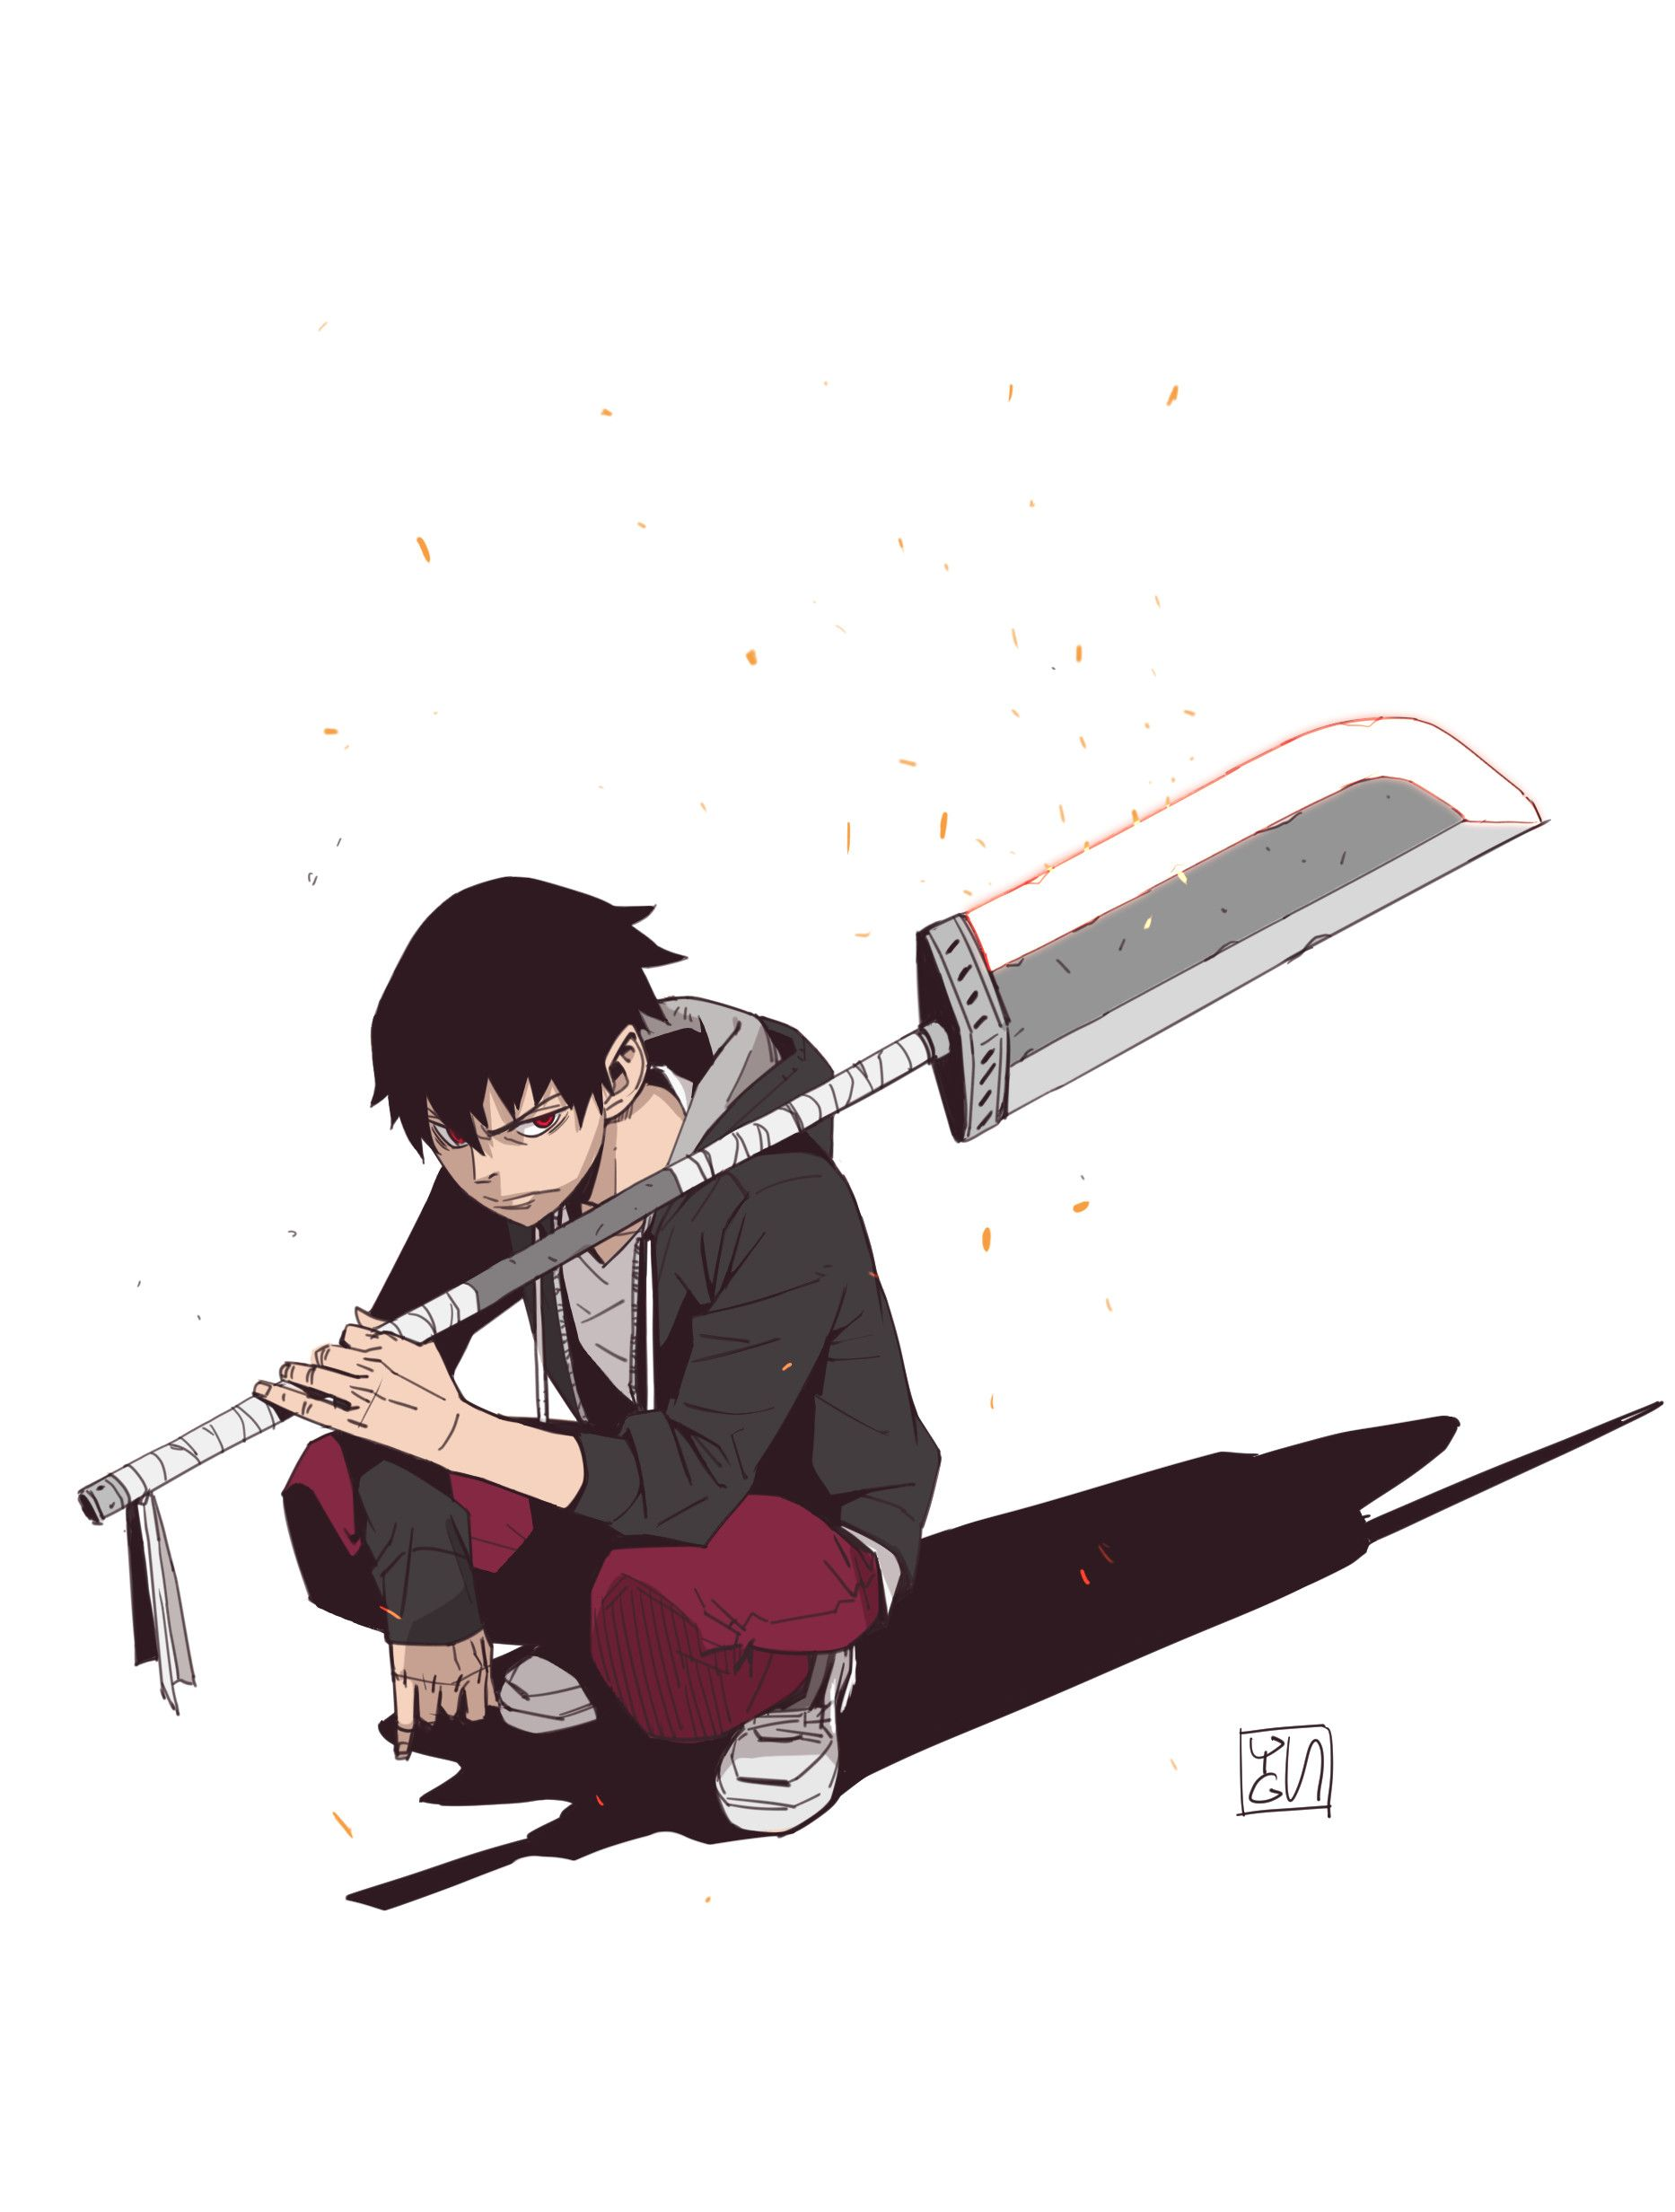 Swordsman by YUNGUN Y on ArtStation. Anime character